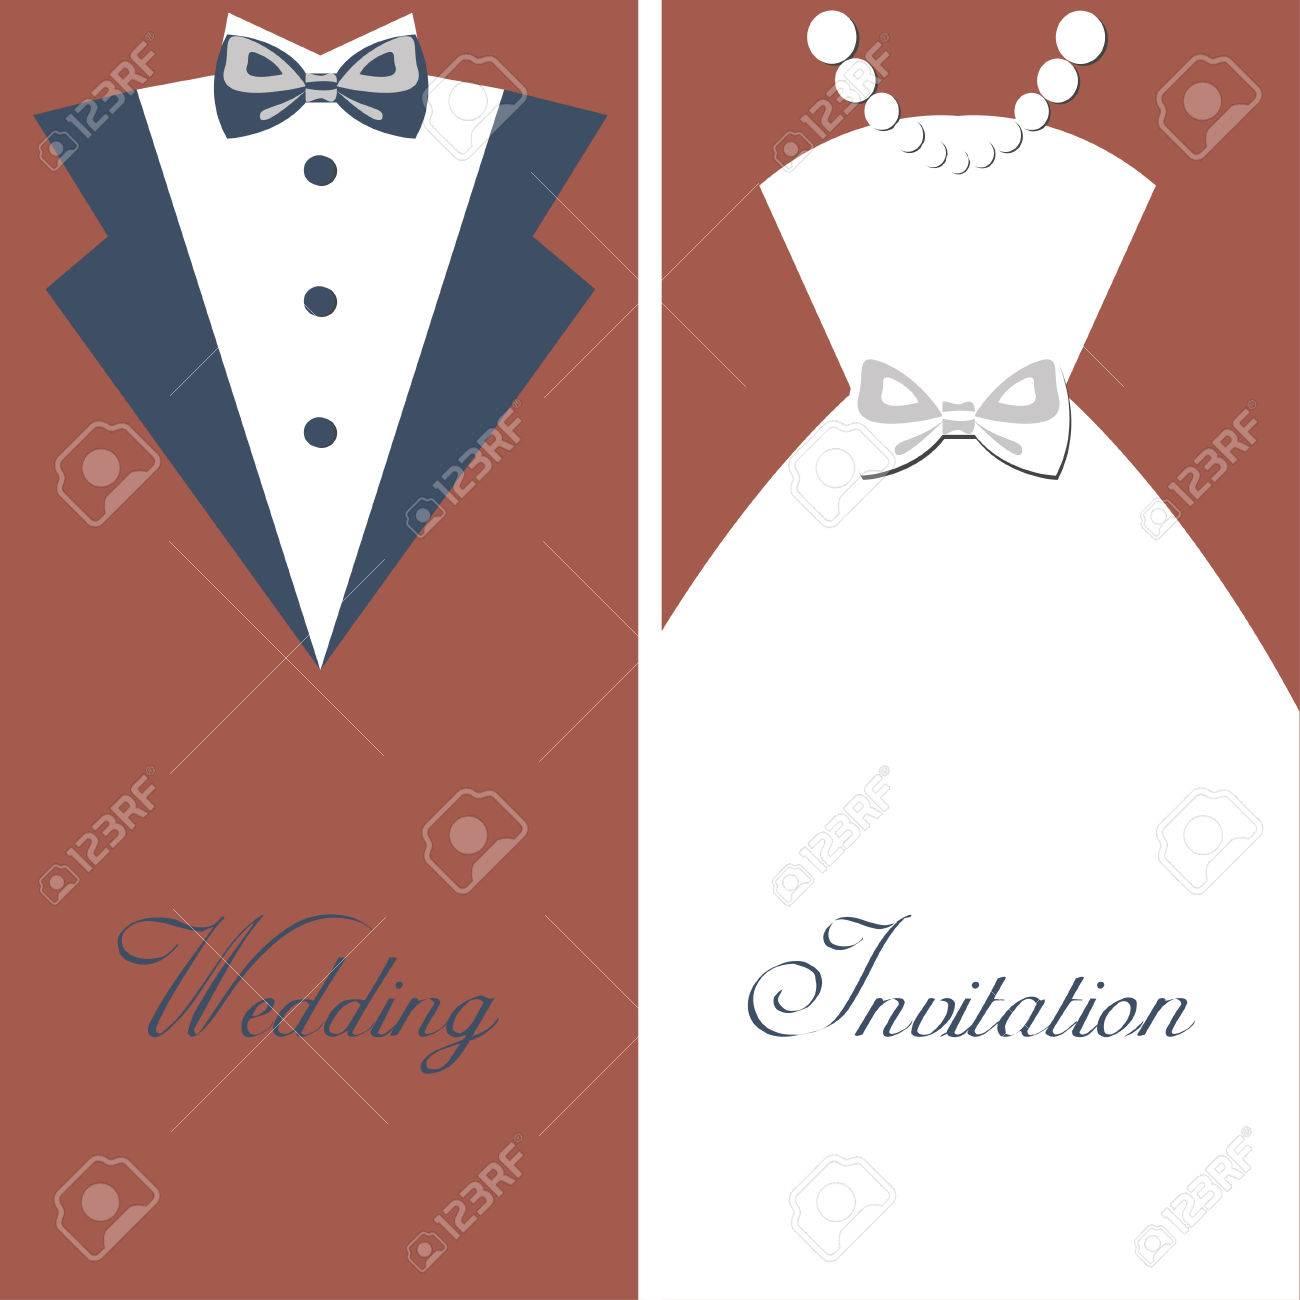 Wedding Invitation Vintage Design Elements, Designers Toolkit ...